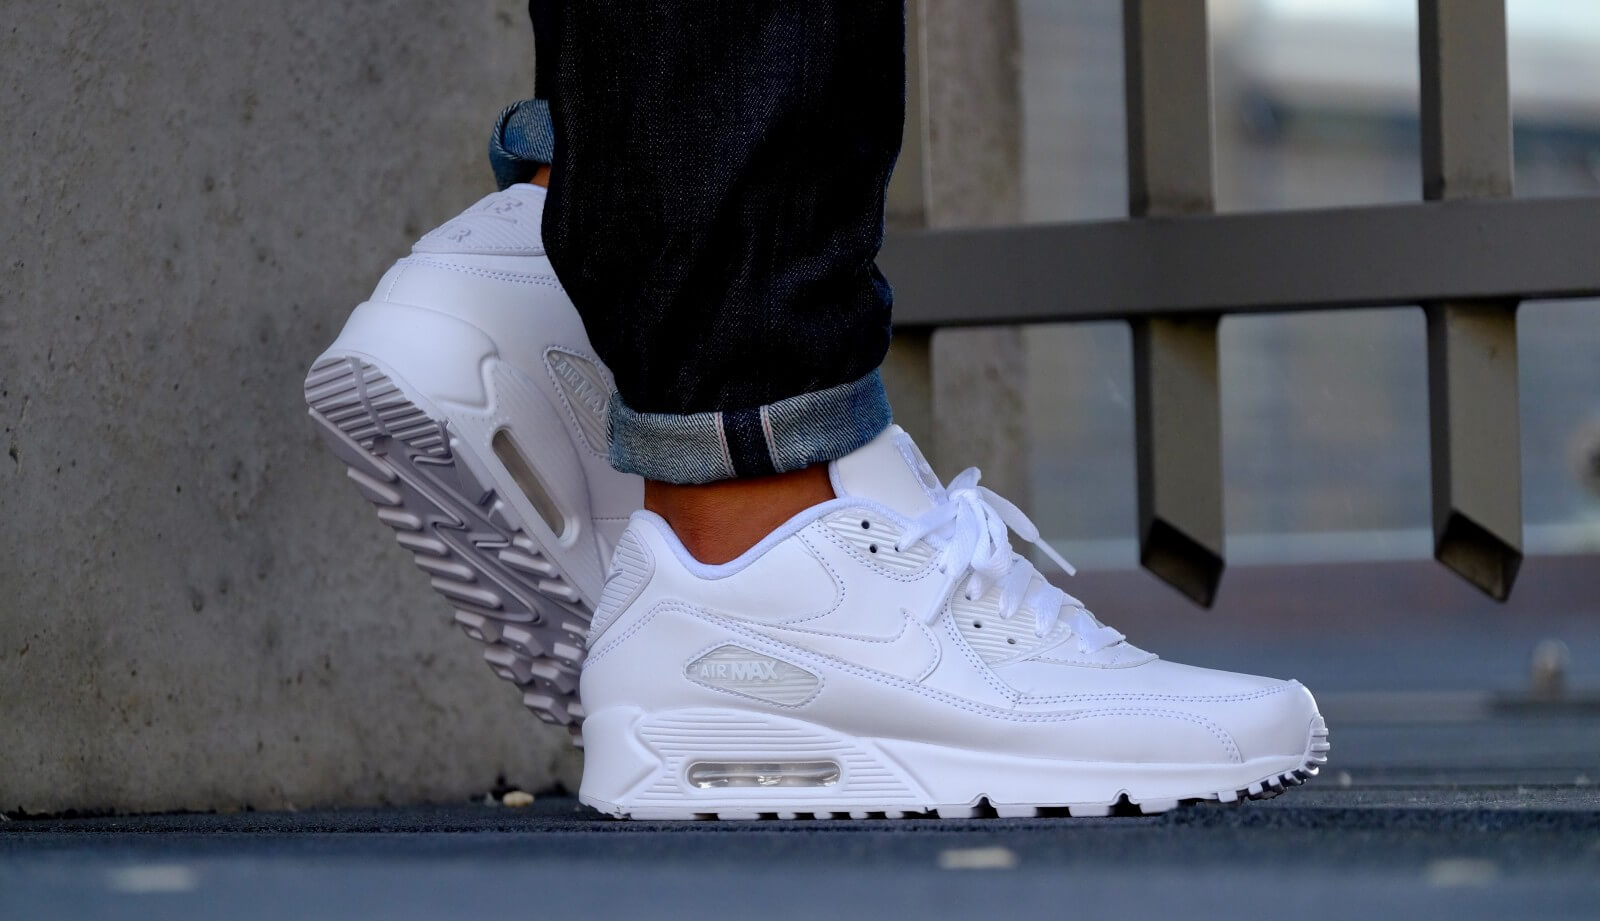 302519 90 Leather Blanc Blanc Air Max 113 Nike ZwYzqq